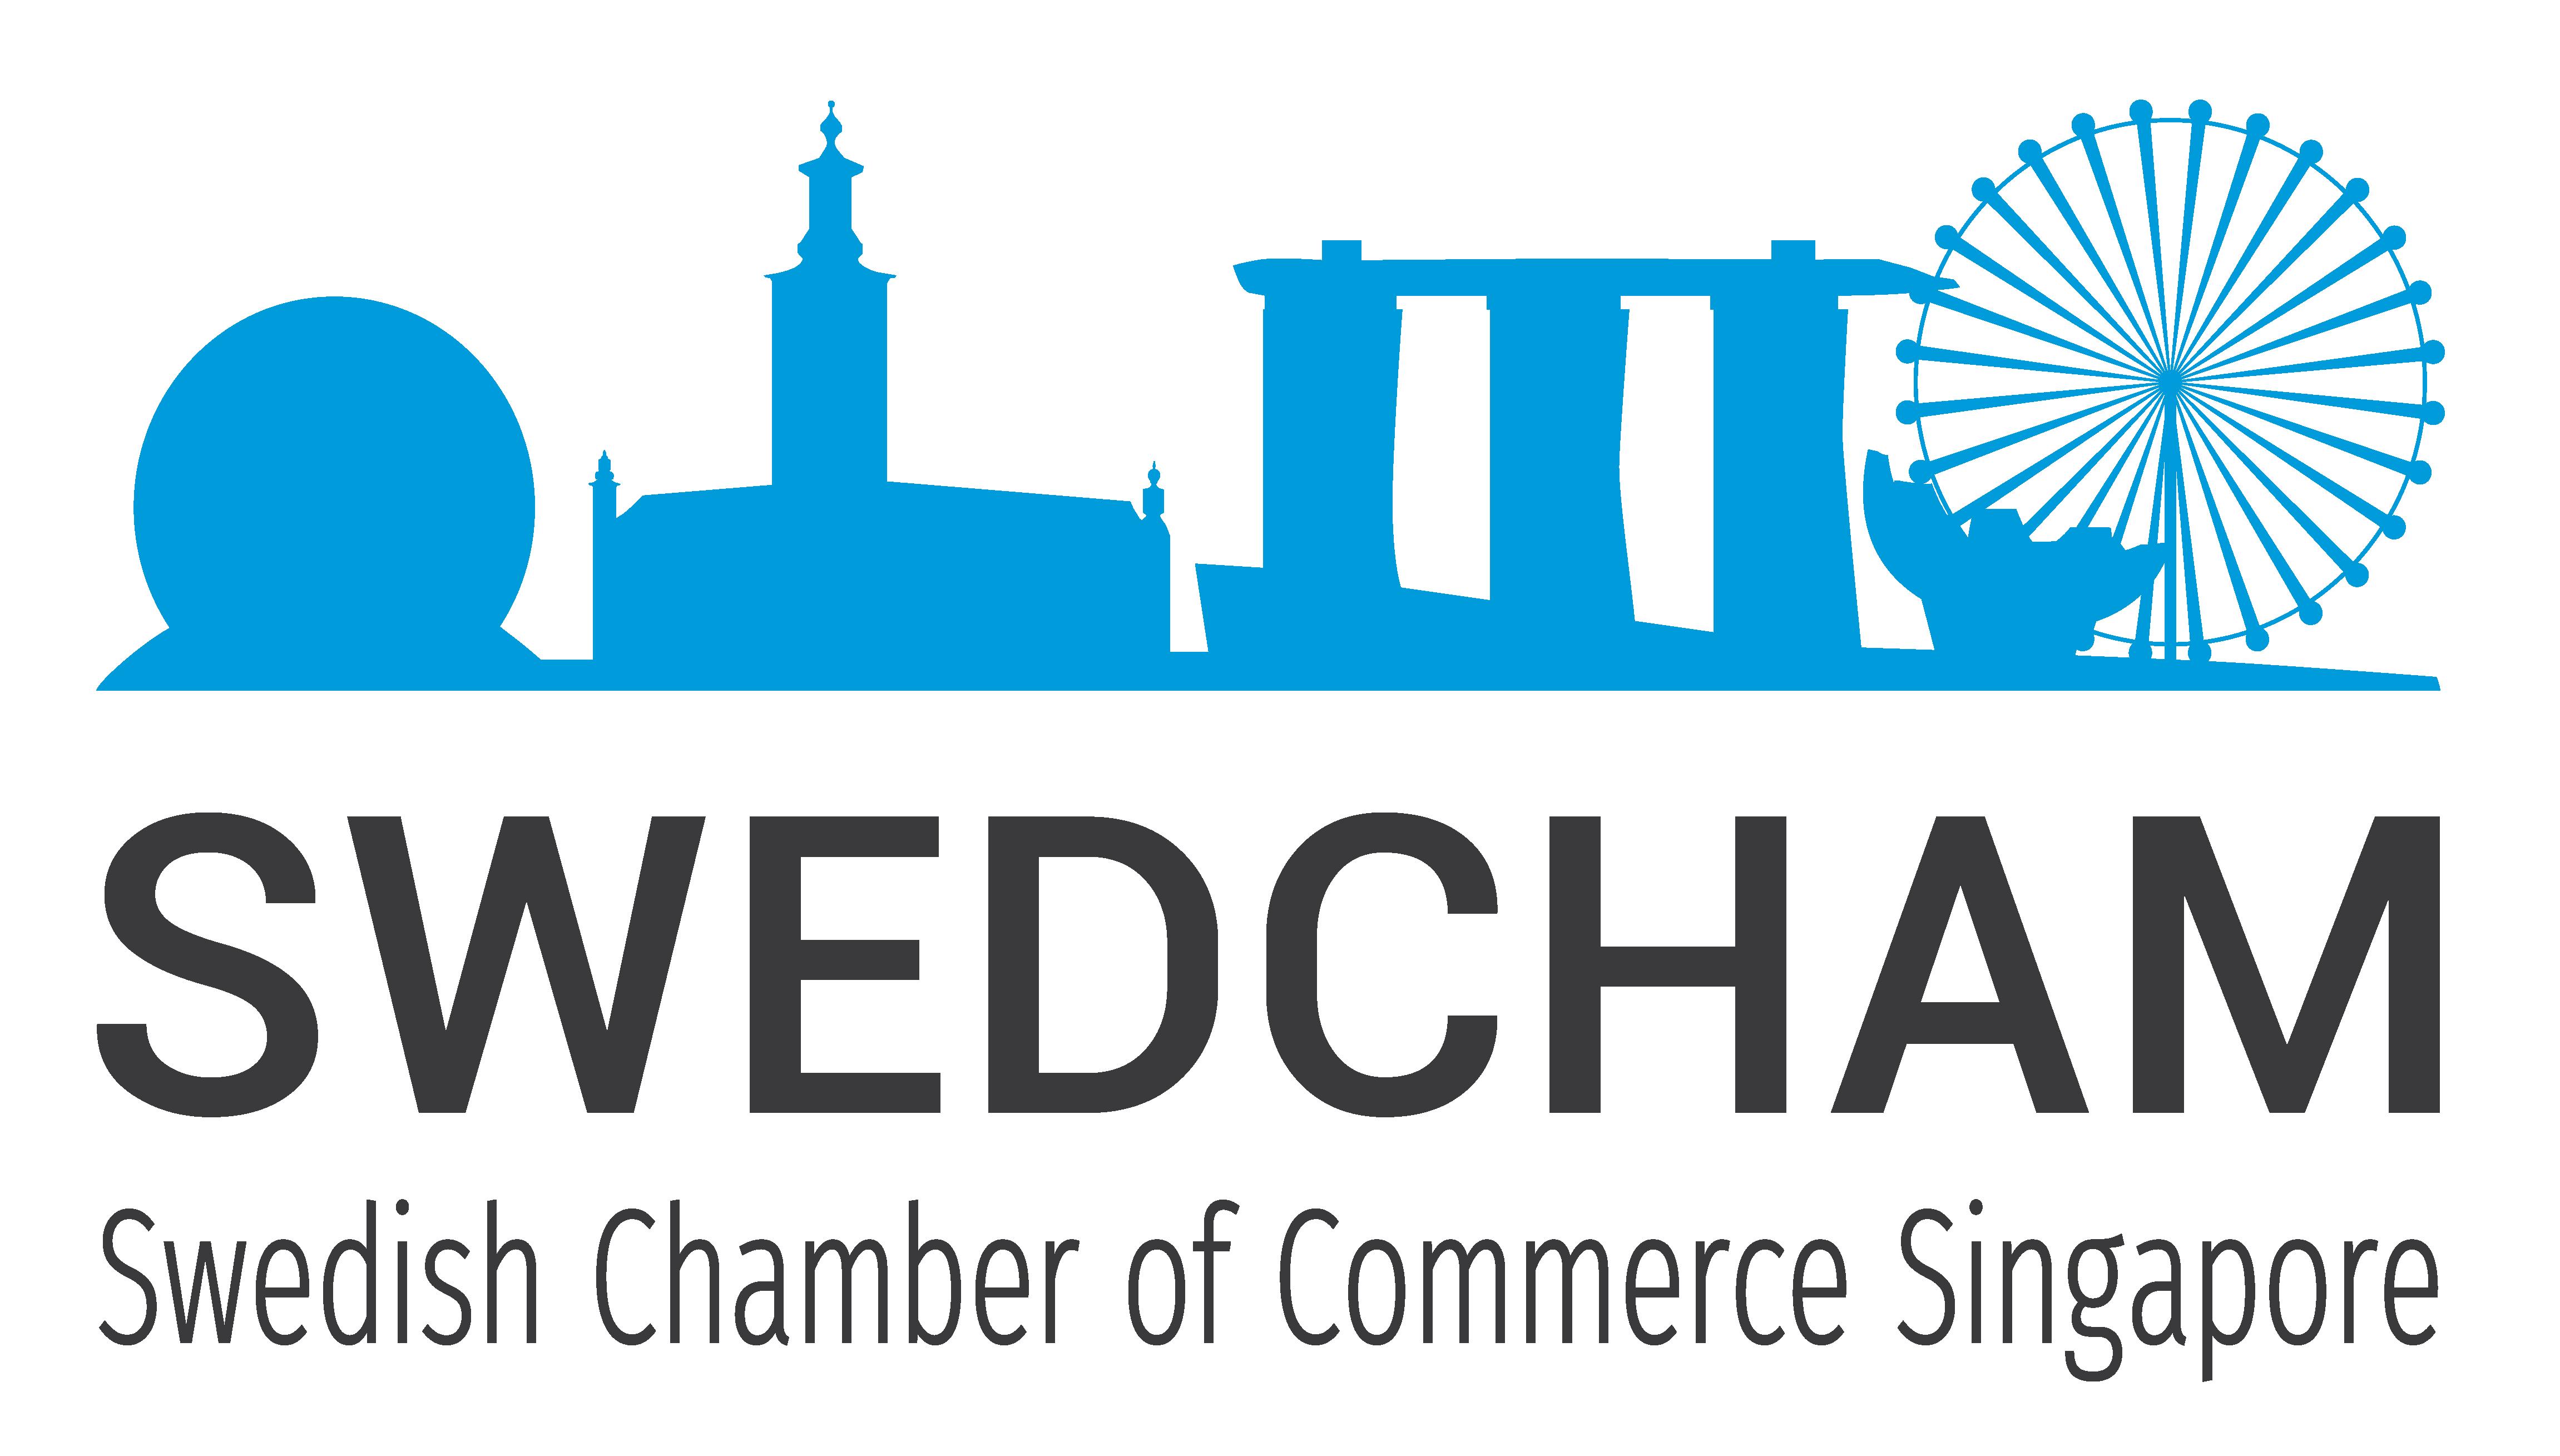 Swedish Chamber of Commerce Singapore